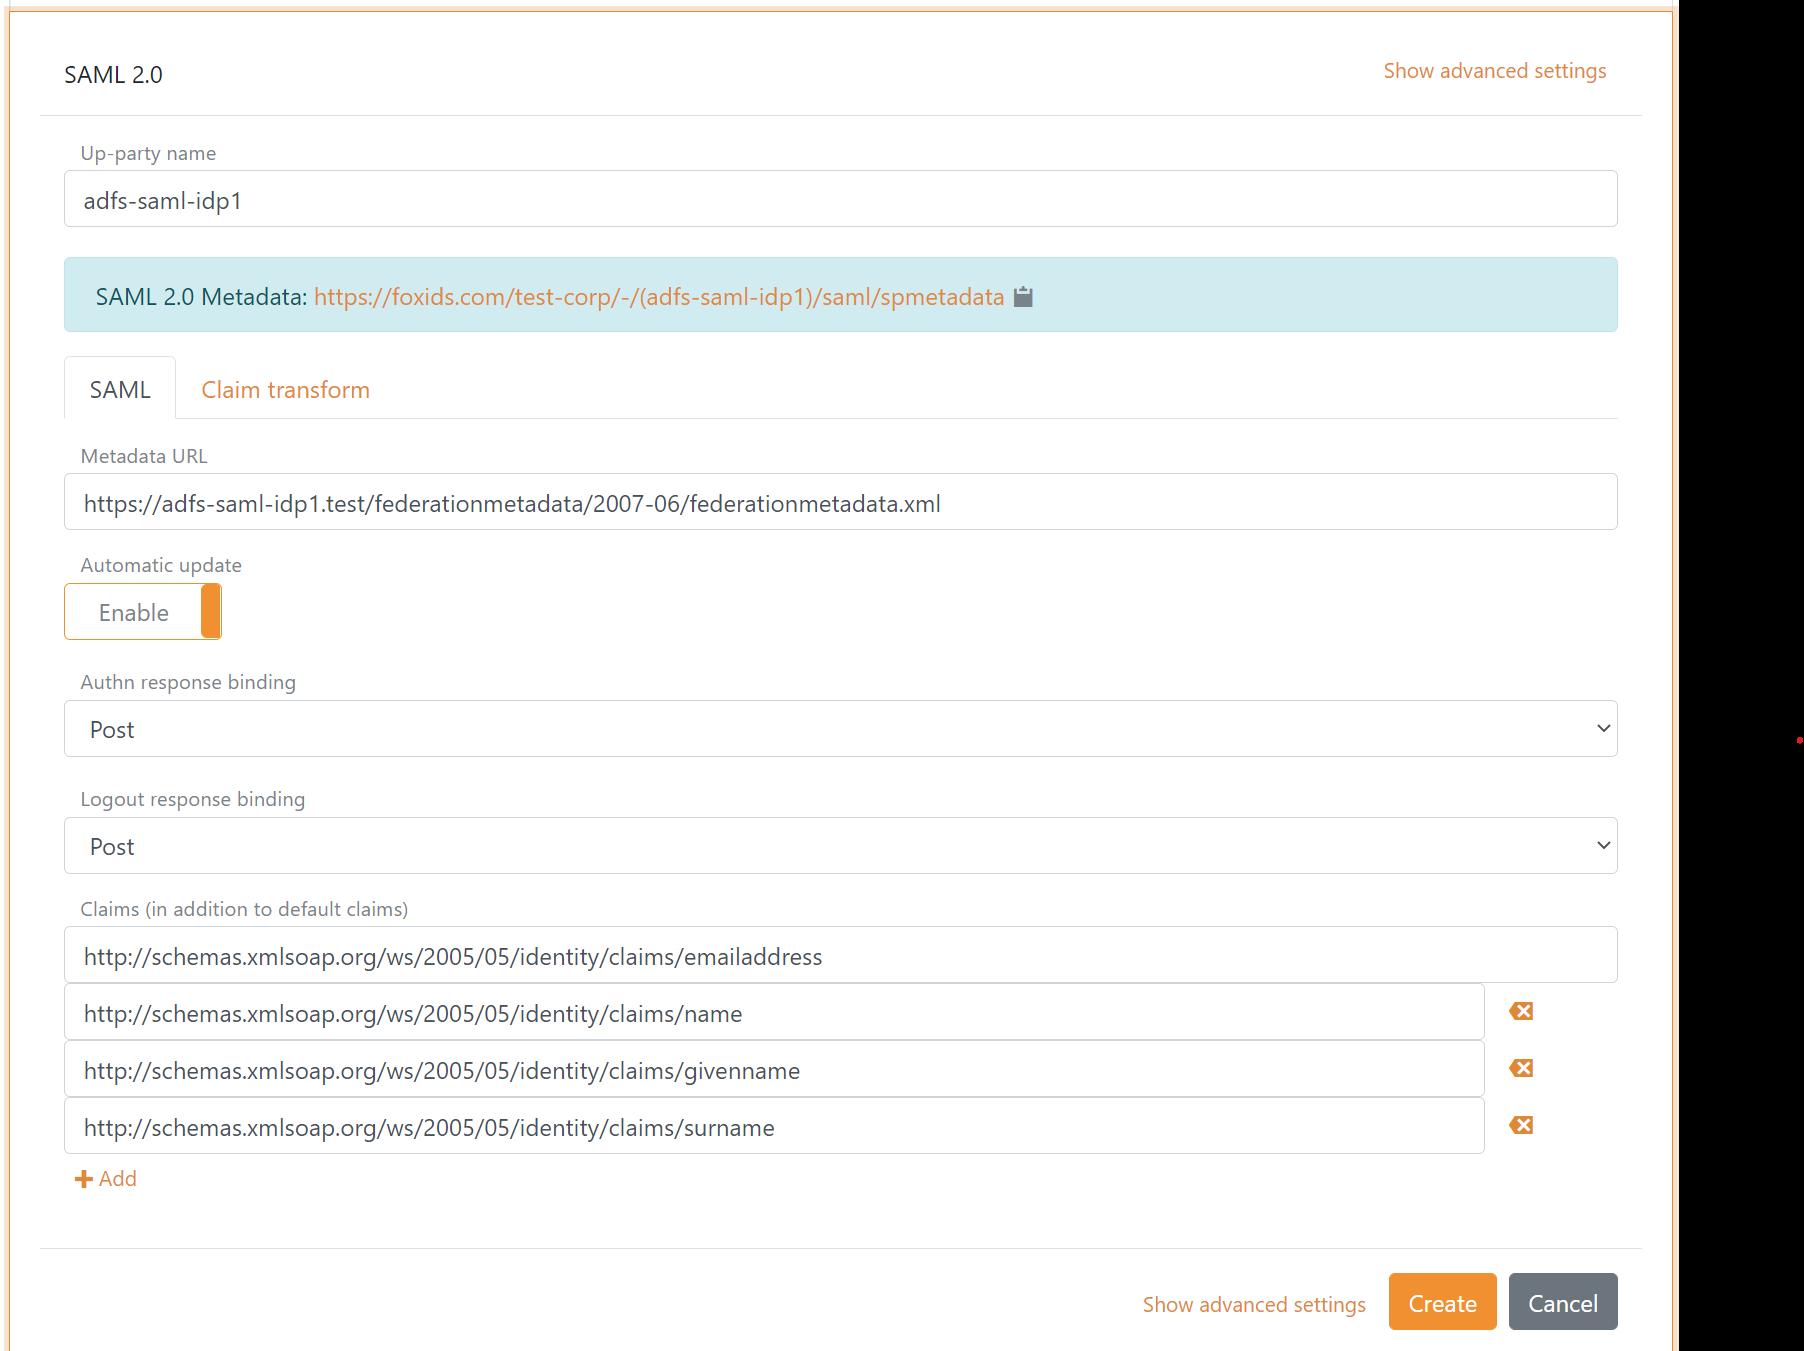 Configure SAML 2.0 AD FS up-party